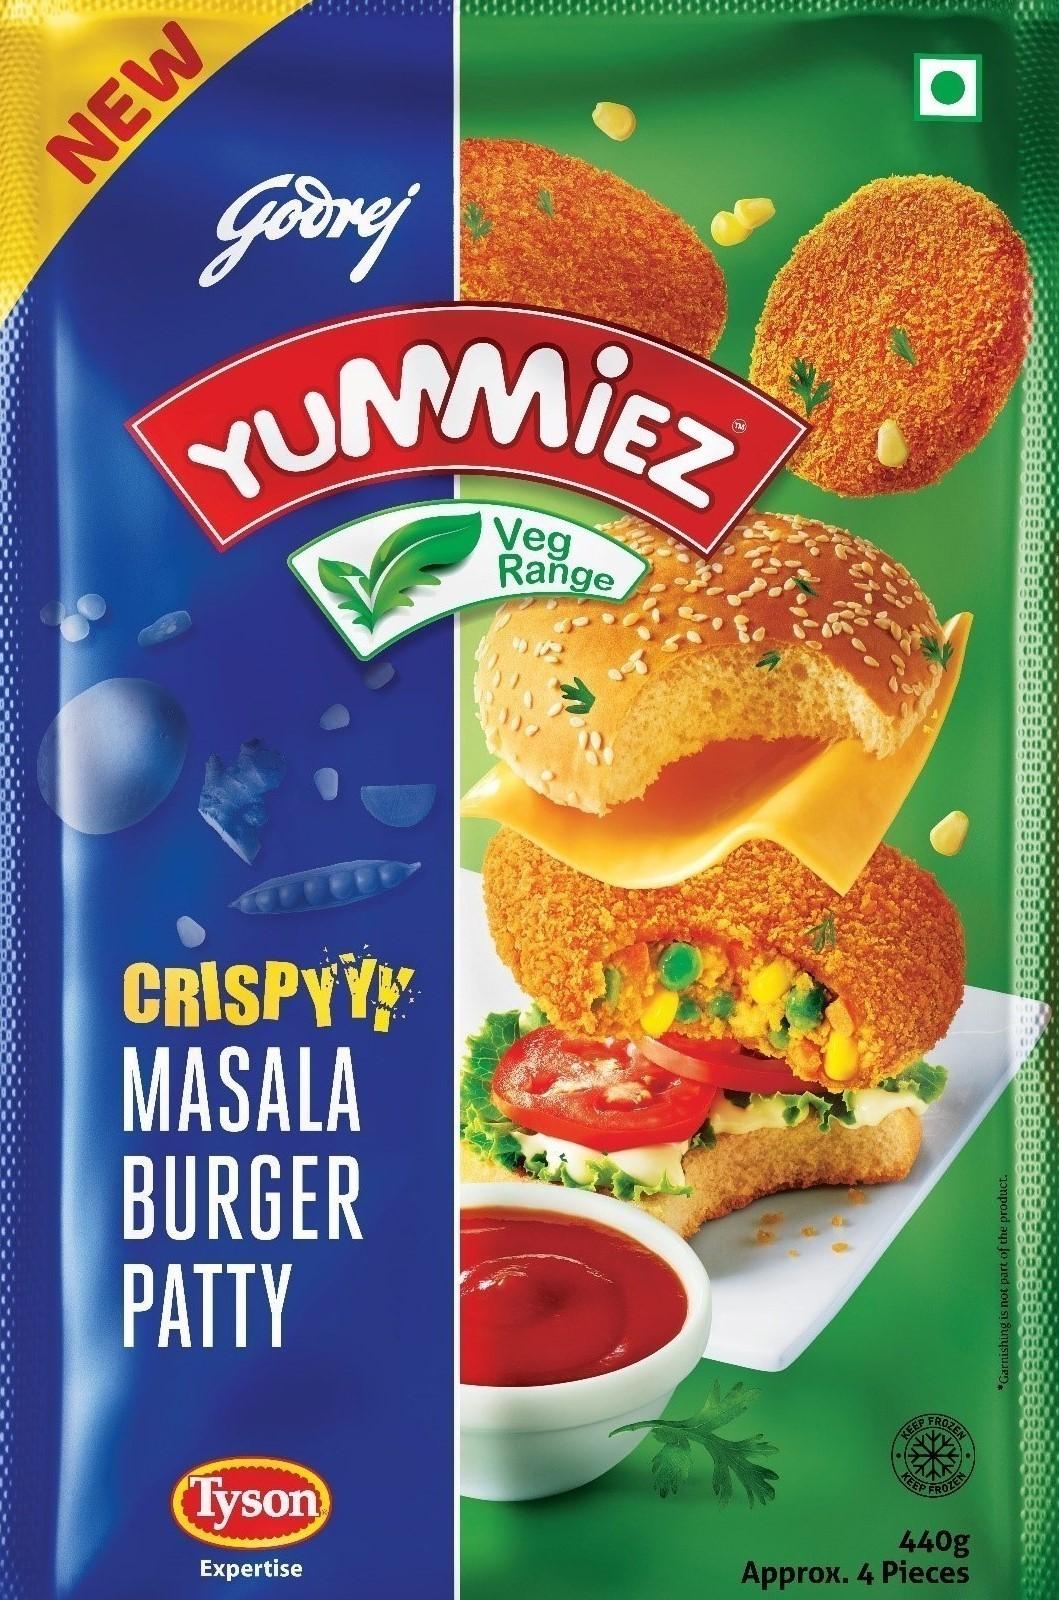 Yummiez Crispy Masala Burger Patty 440 g